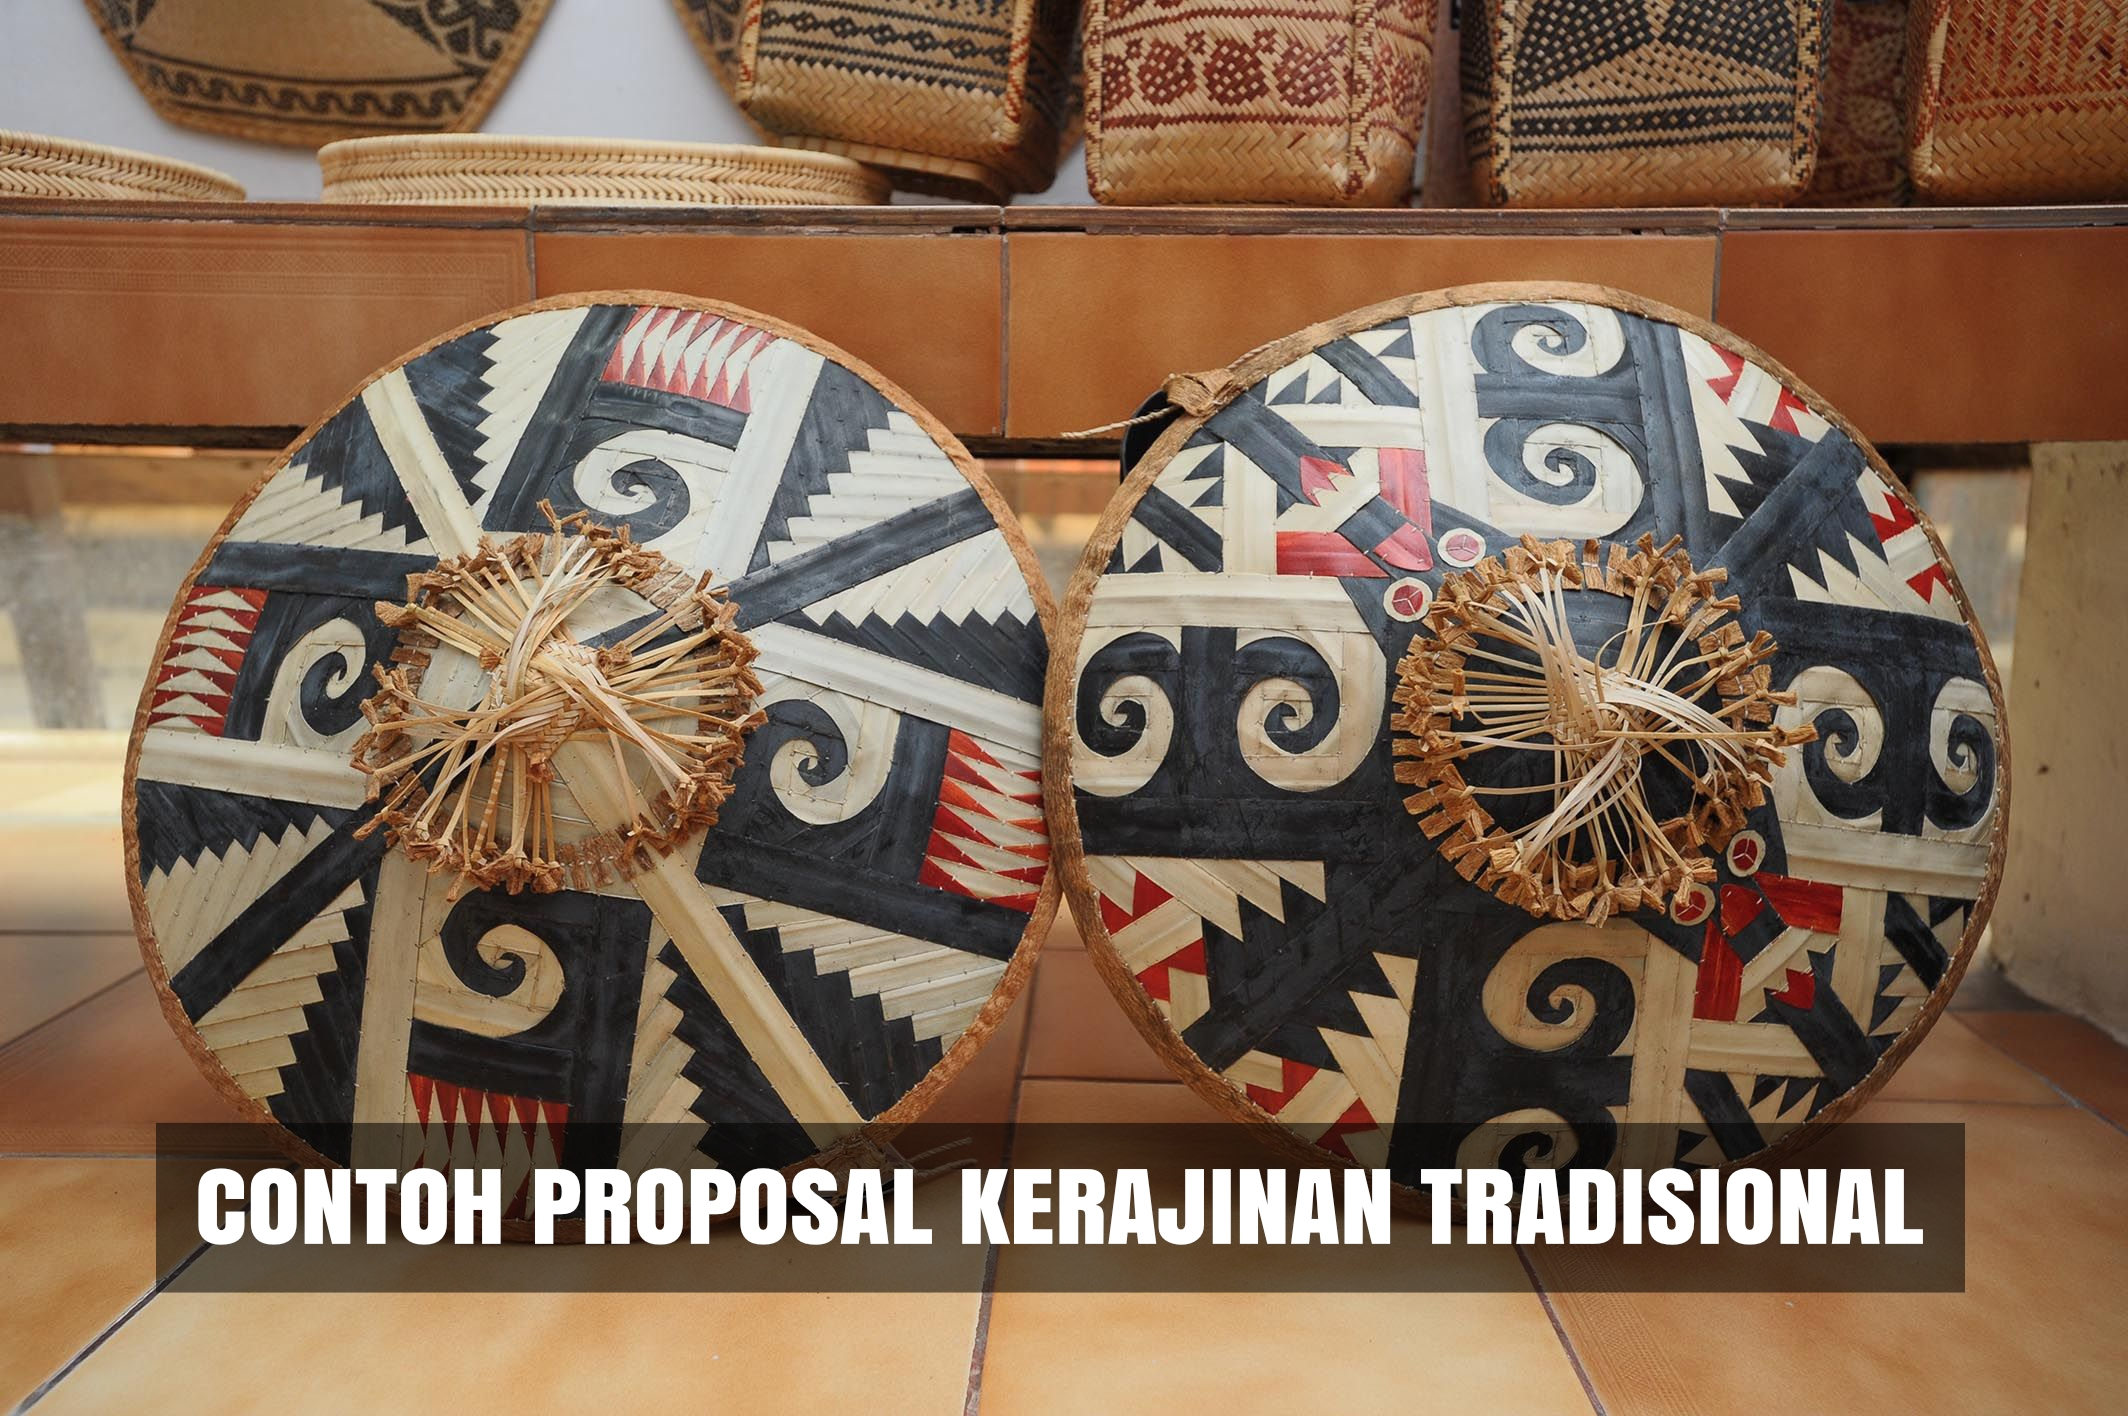 artikel contoh proposal kerajinan tradisional